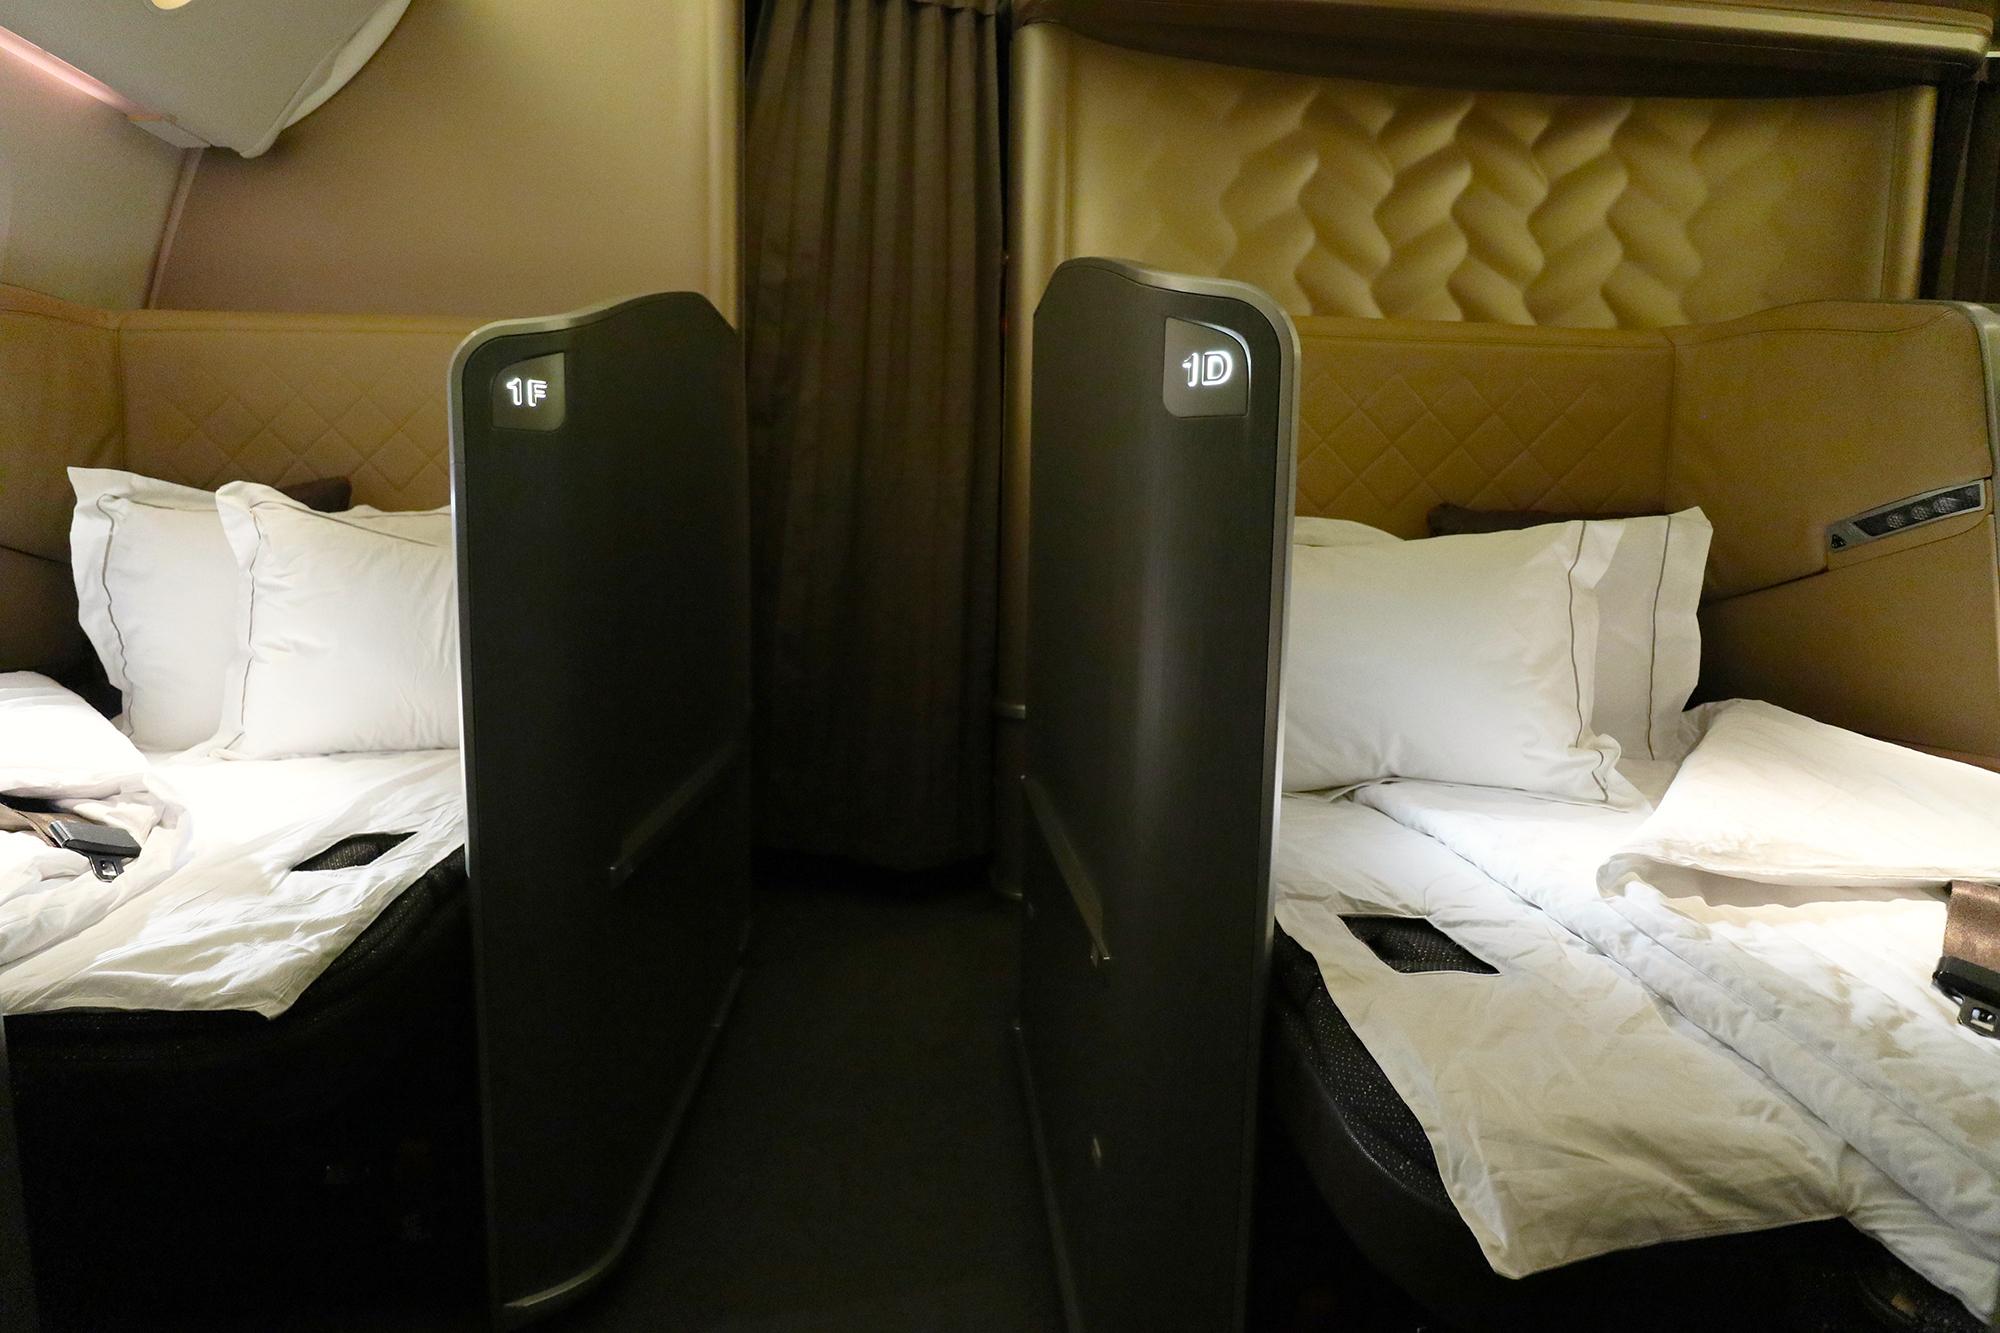 Both Beds.jpg